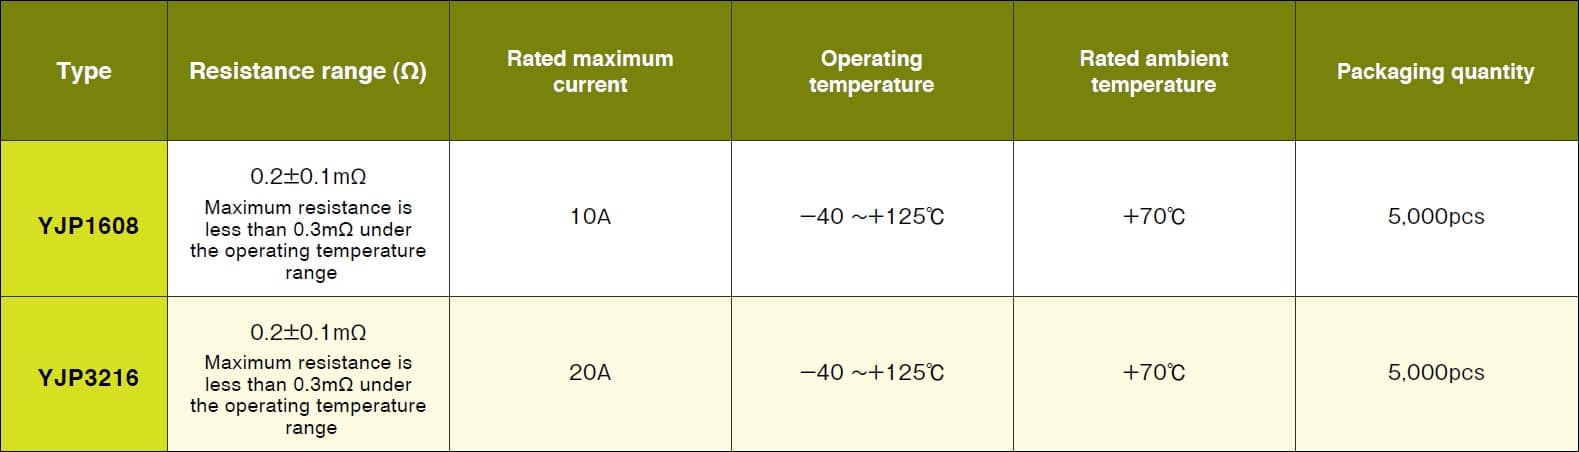 Susumu YJP1608 Specifications